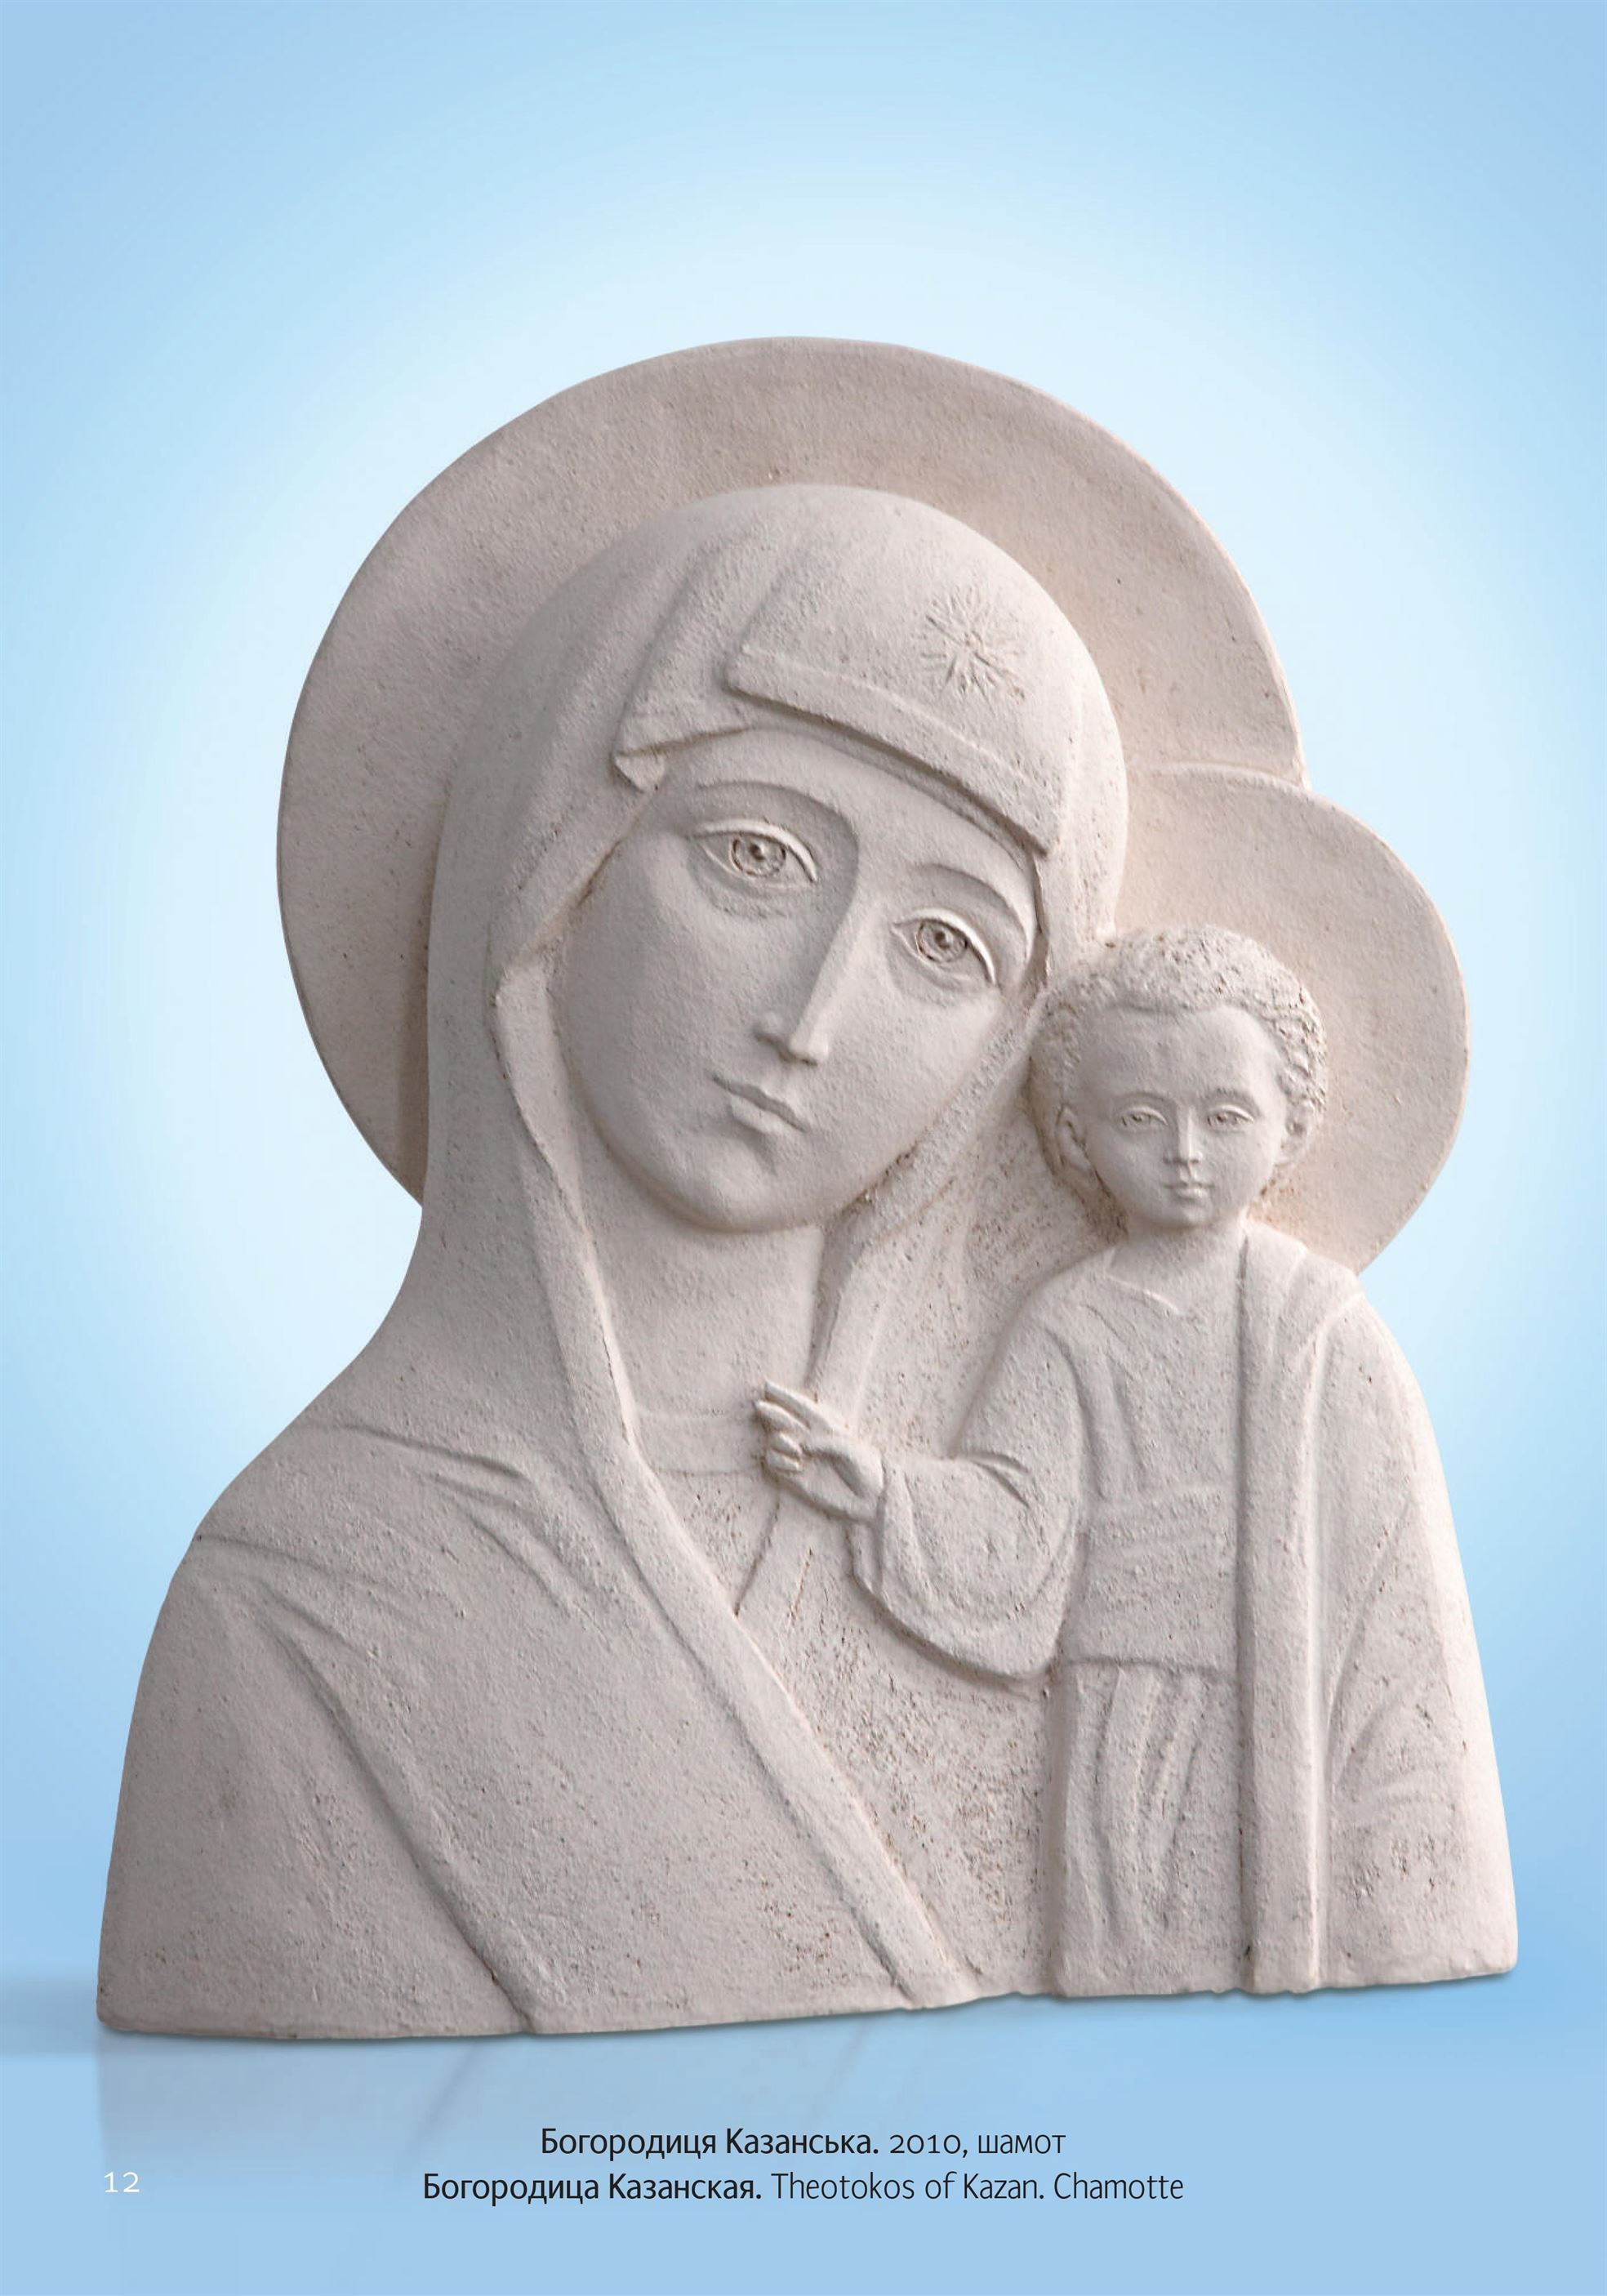 Скульптура казанская богородица